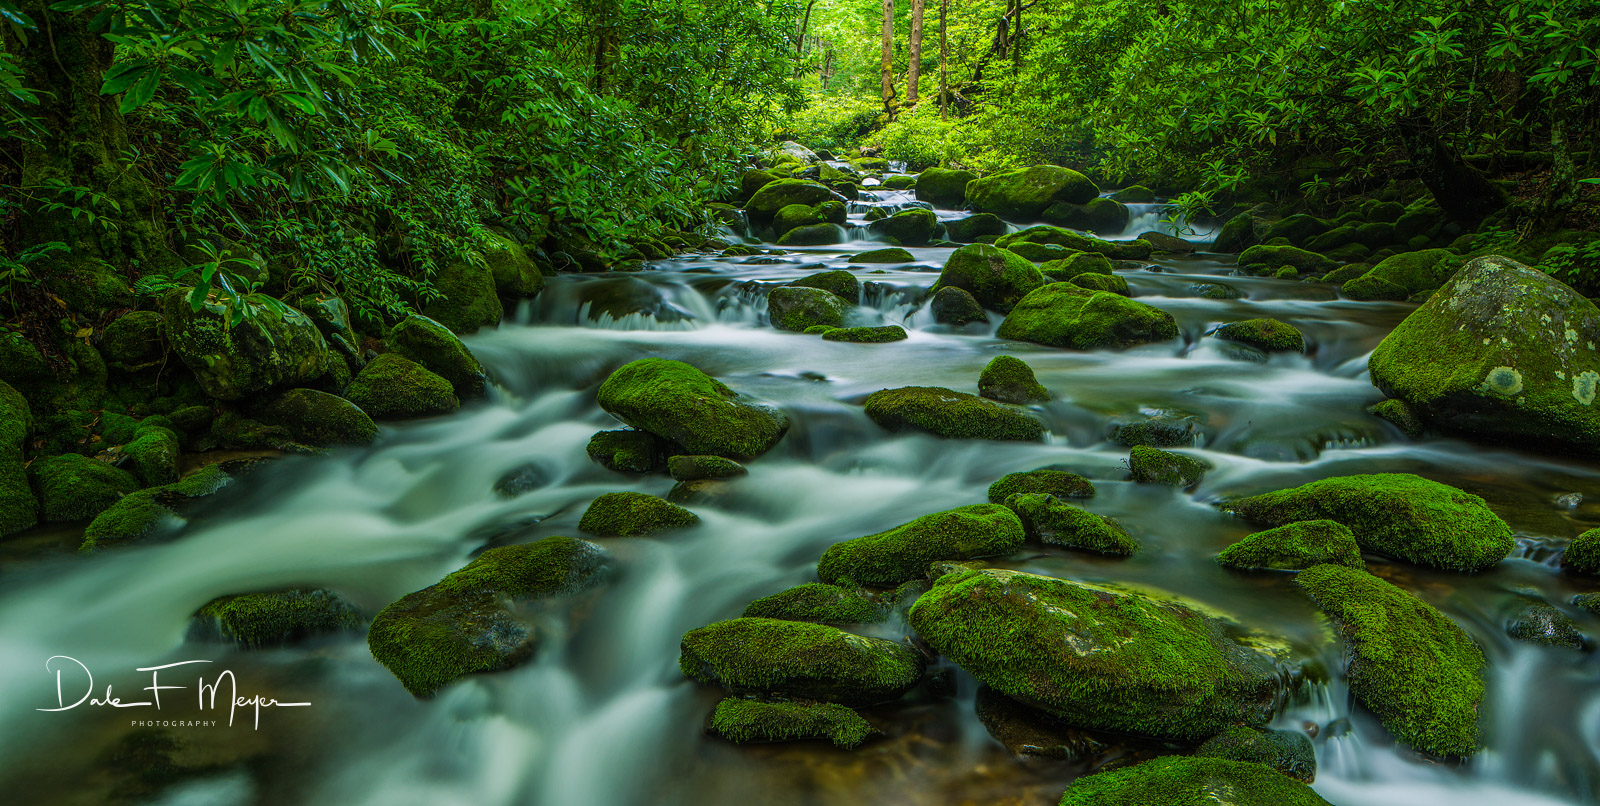 Great Smoky Mountains,Roaring Fork,Spring 2013,moss rocks,running water, photo